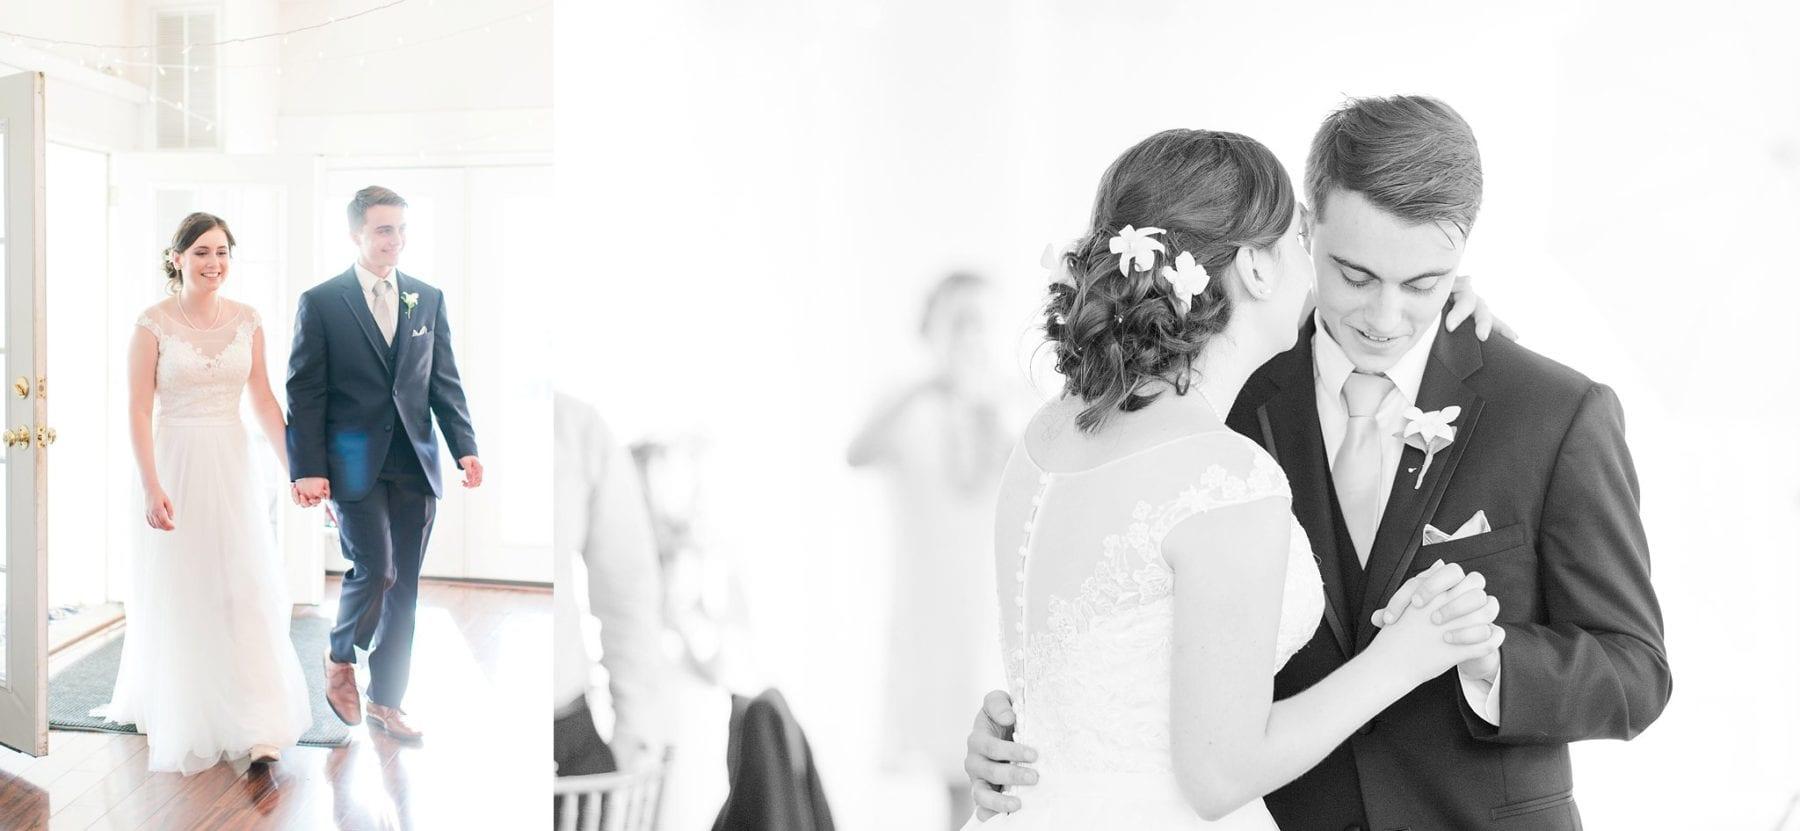 Bristow Manor Wedding Photos Virginia Wedding Photographer Lauren & Andrew Megan Kelsey Photography-649.jpg